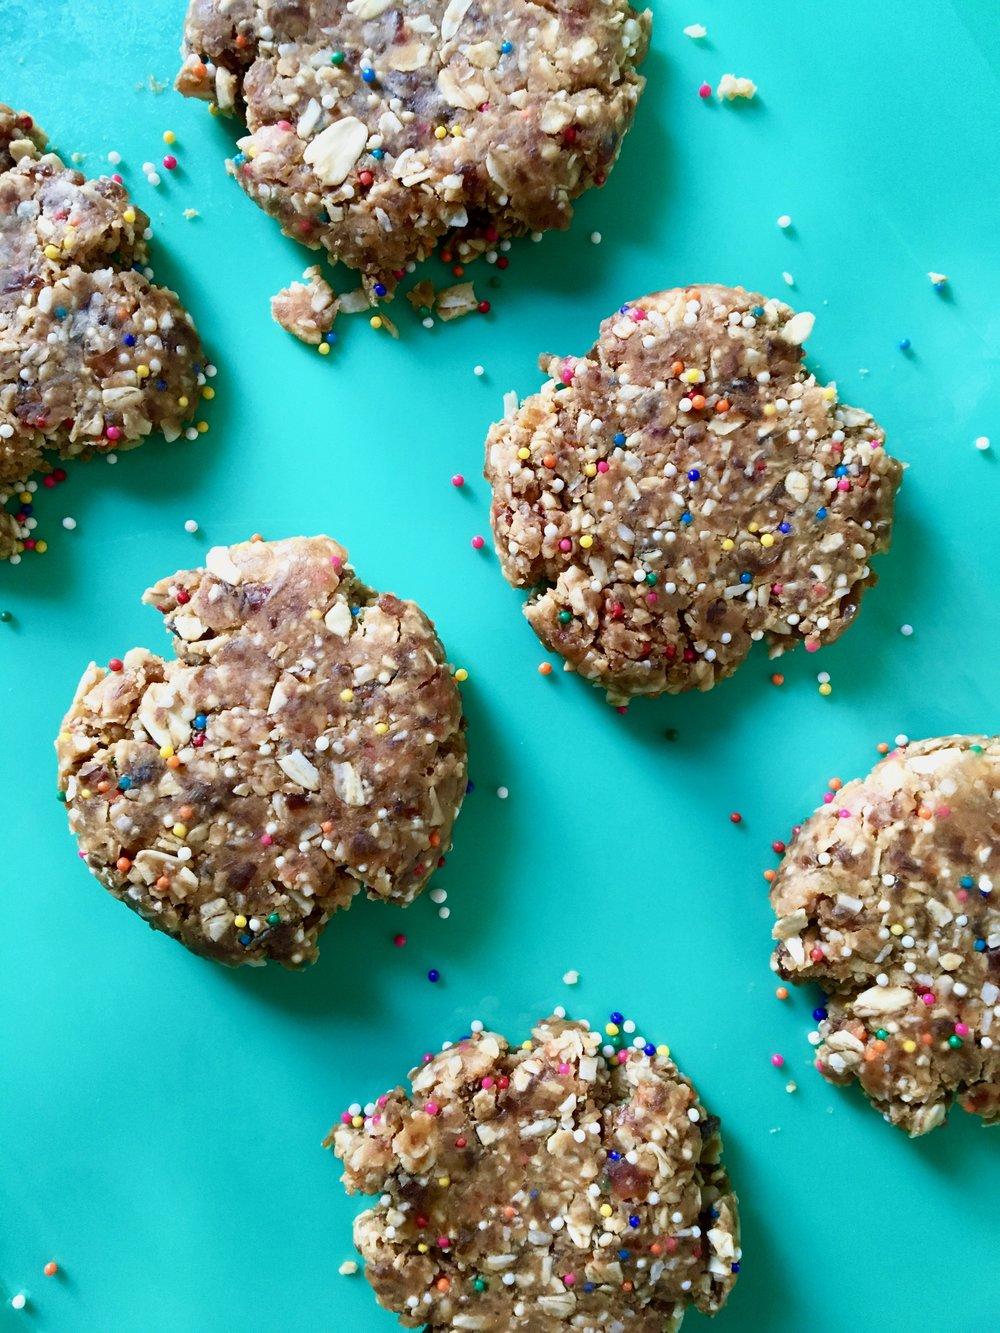 Raw Vegan Loaded Oatmeal (Peanut Butter Coconut Funfetti) Cookies